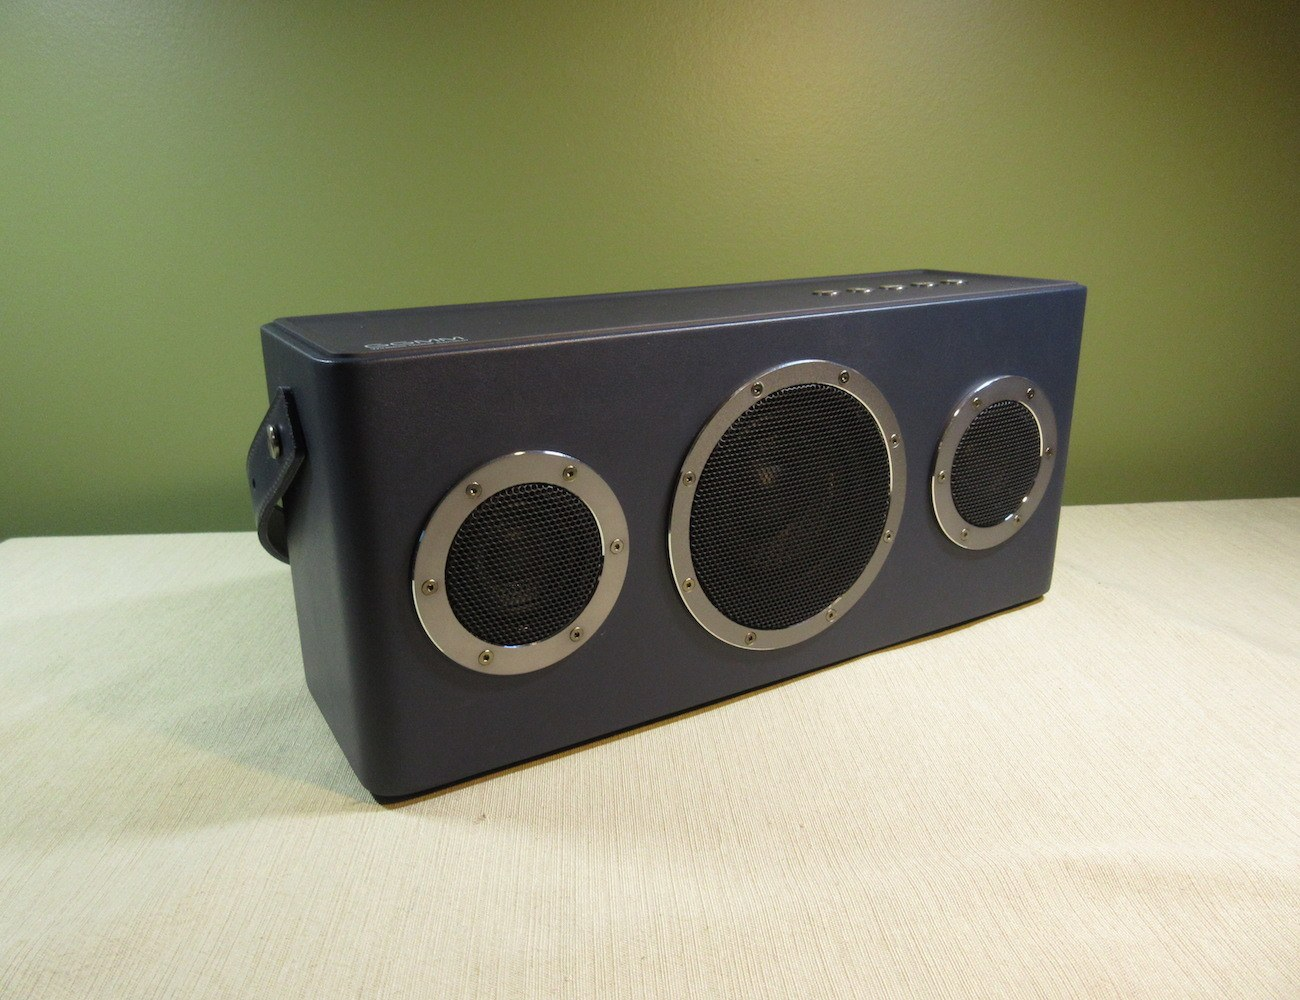 GGMM M4 WiFi Wireless Bluetooth Speakers